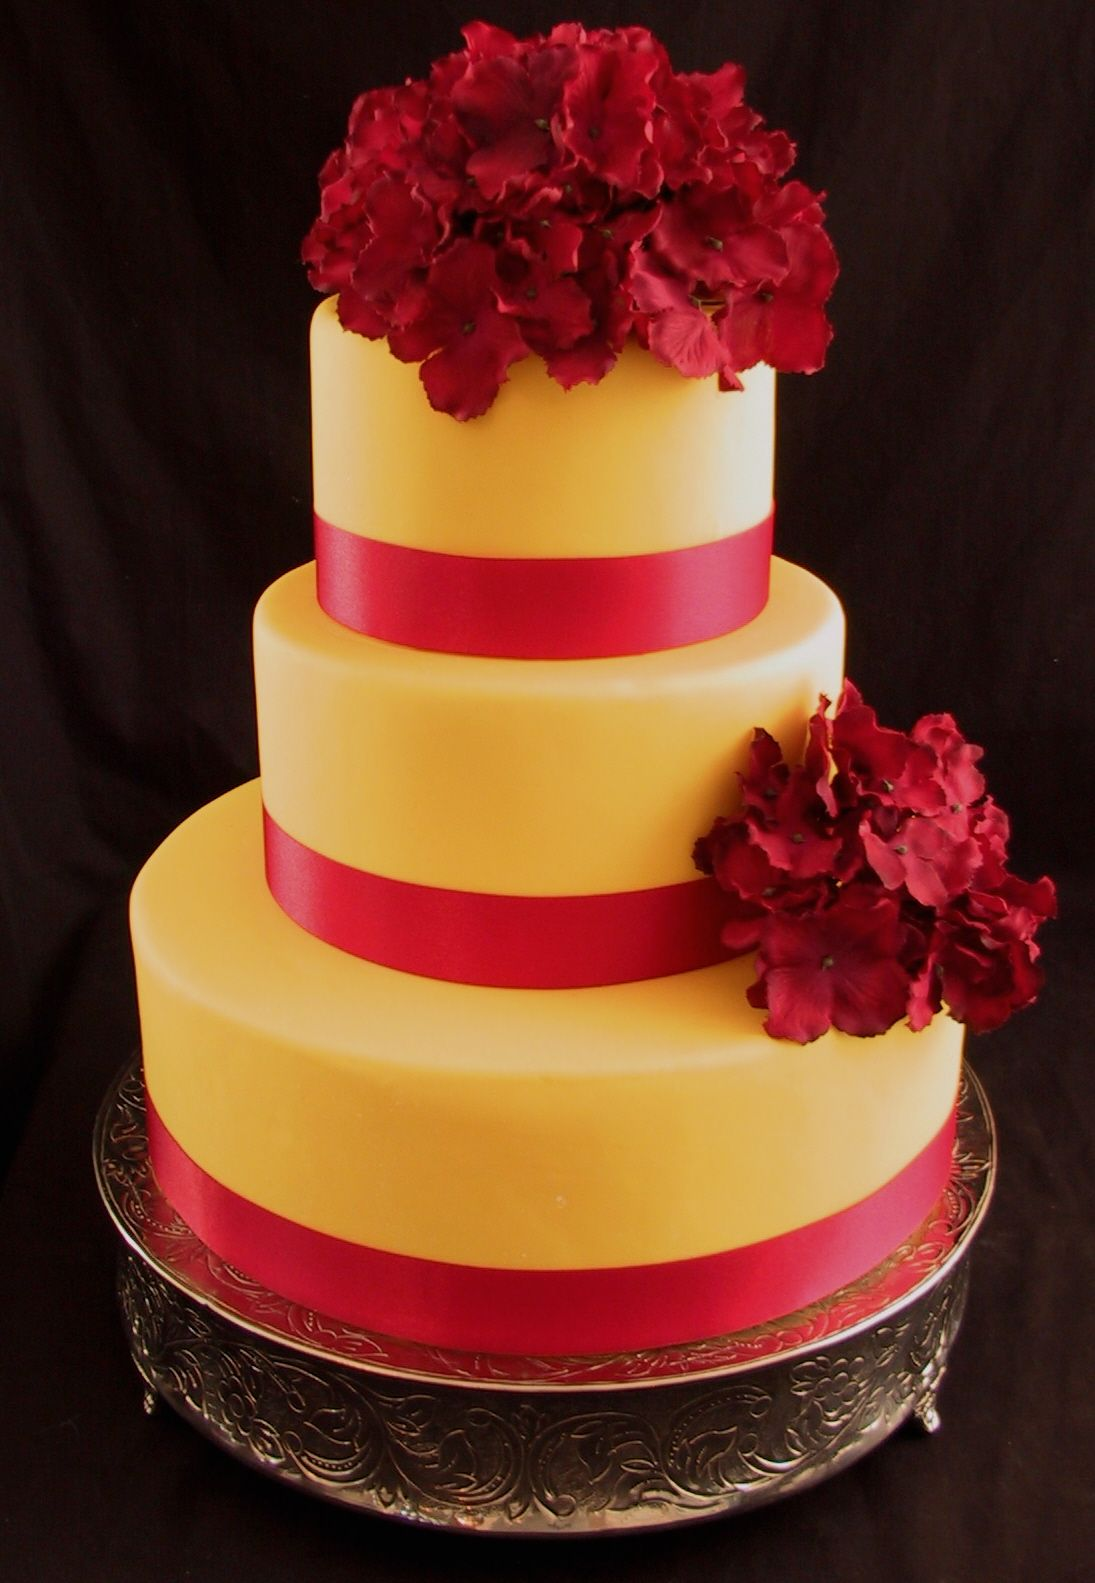 Red and Yellow Hydrangea Wedding Cake | Pinterest | Striped wedding ...